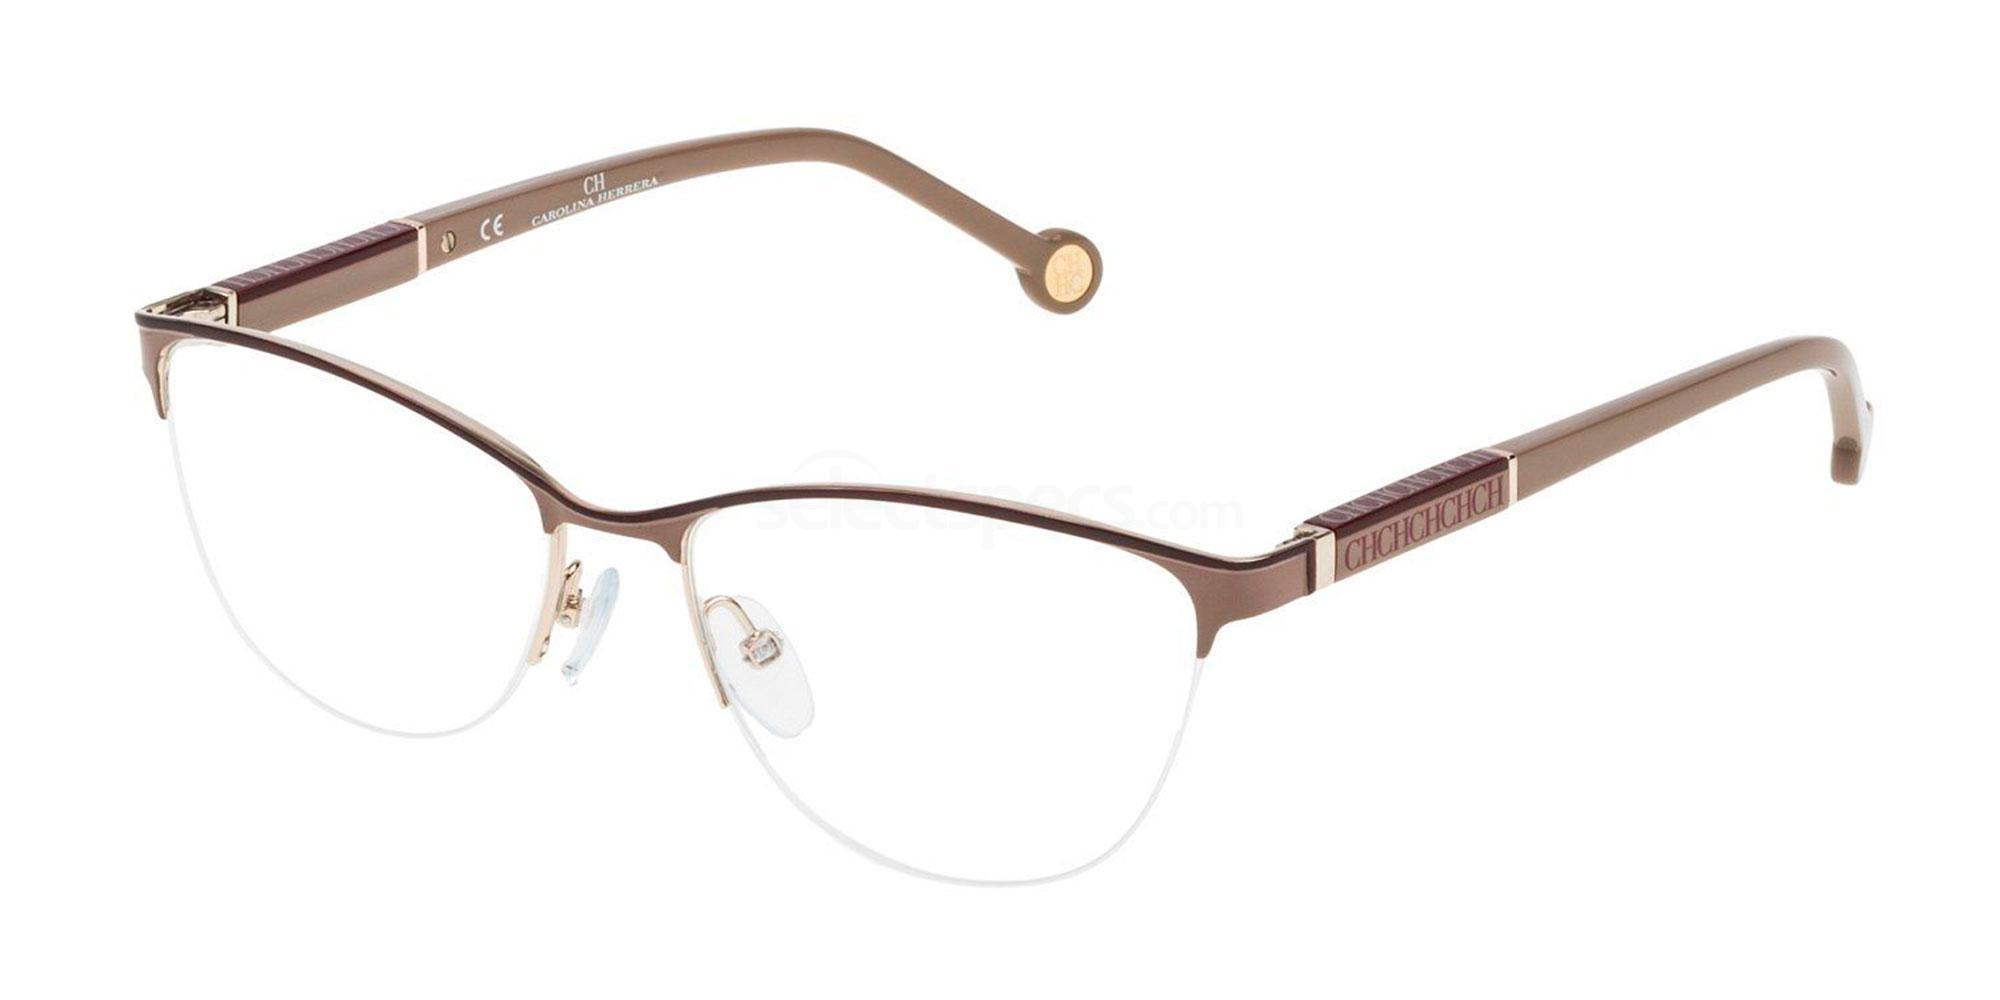 0484 VHE079 Glasses, CH Carolina Herrera